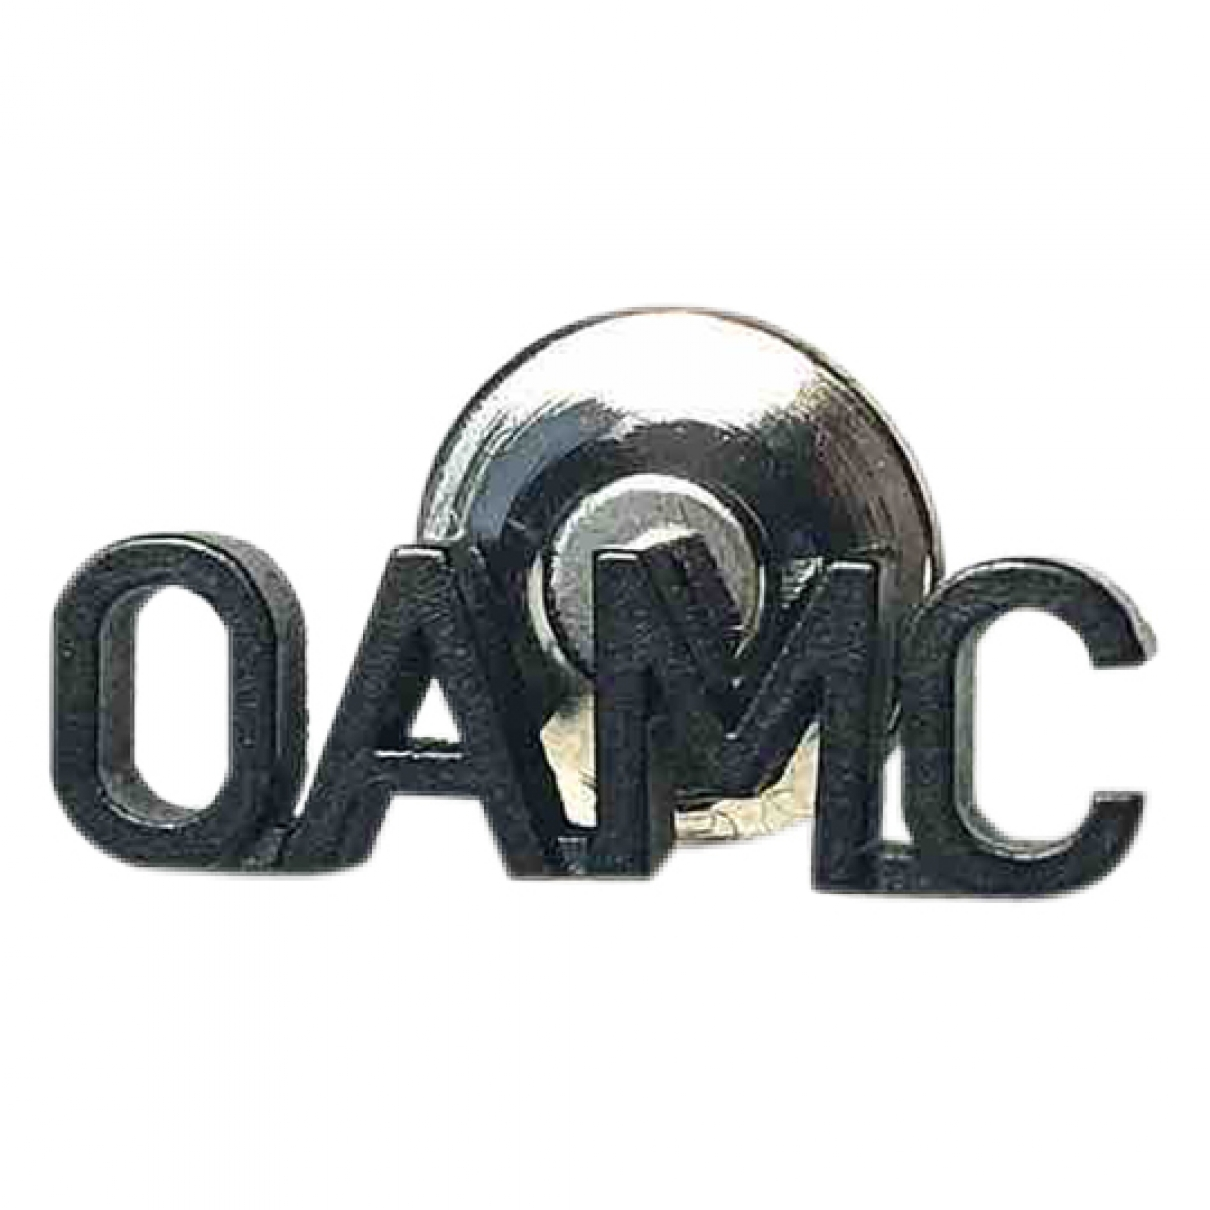 Oamc \N Schmuckstuecke in  Schwarz Metall